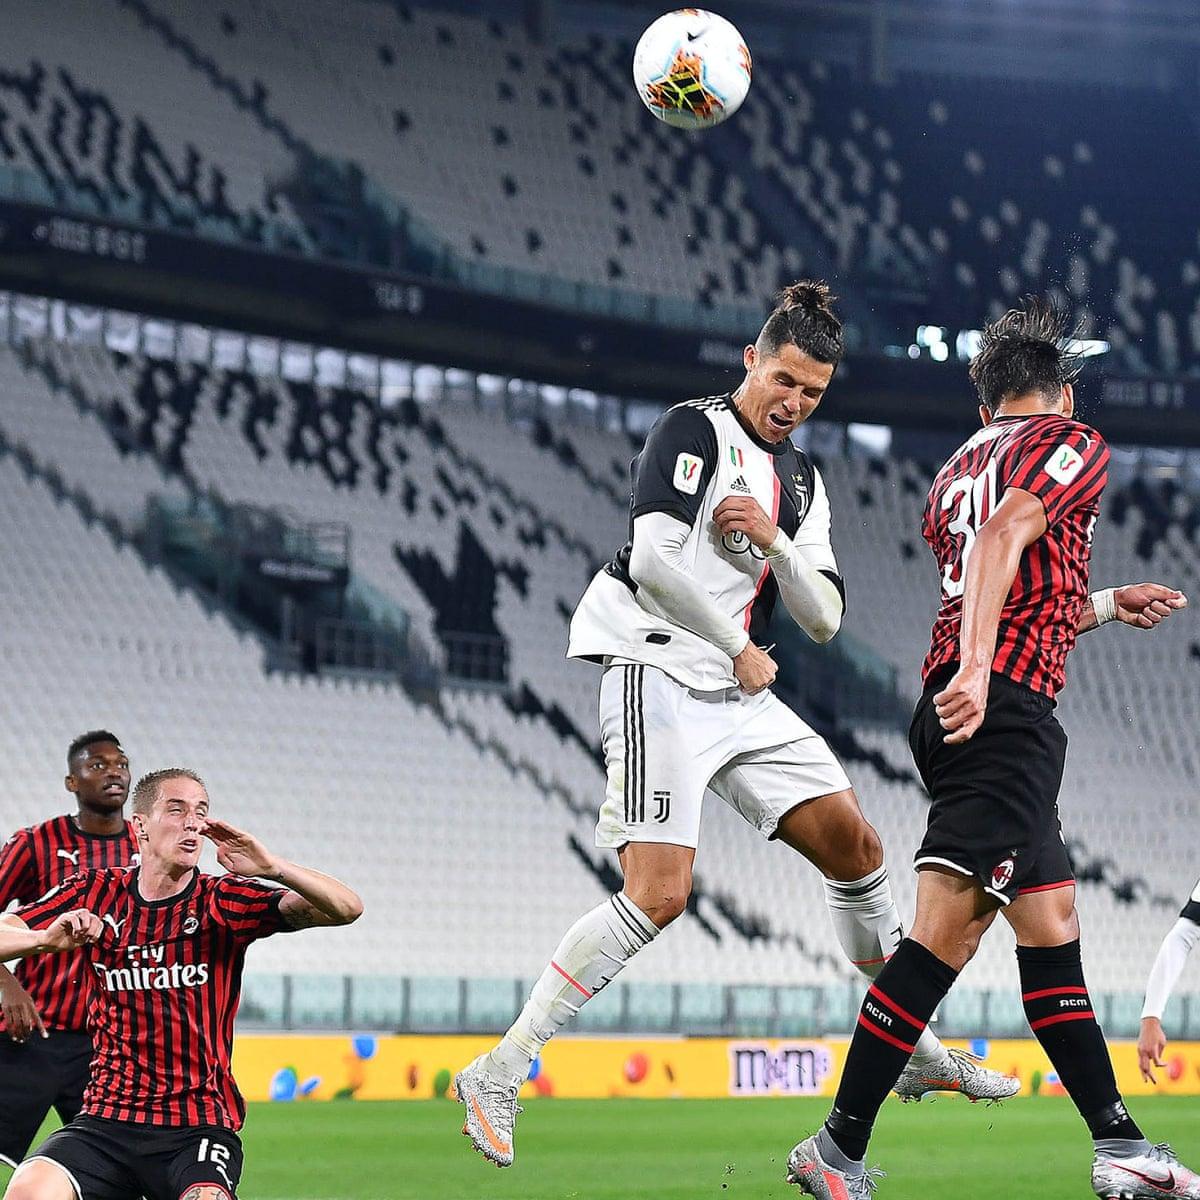 Juventus Reach Coppa Italia Final After Stalemate Despite Ronaldo Penalty Miss European Club Football The Guardian